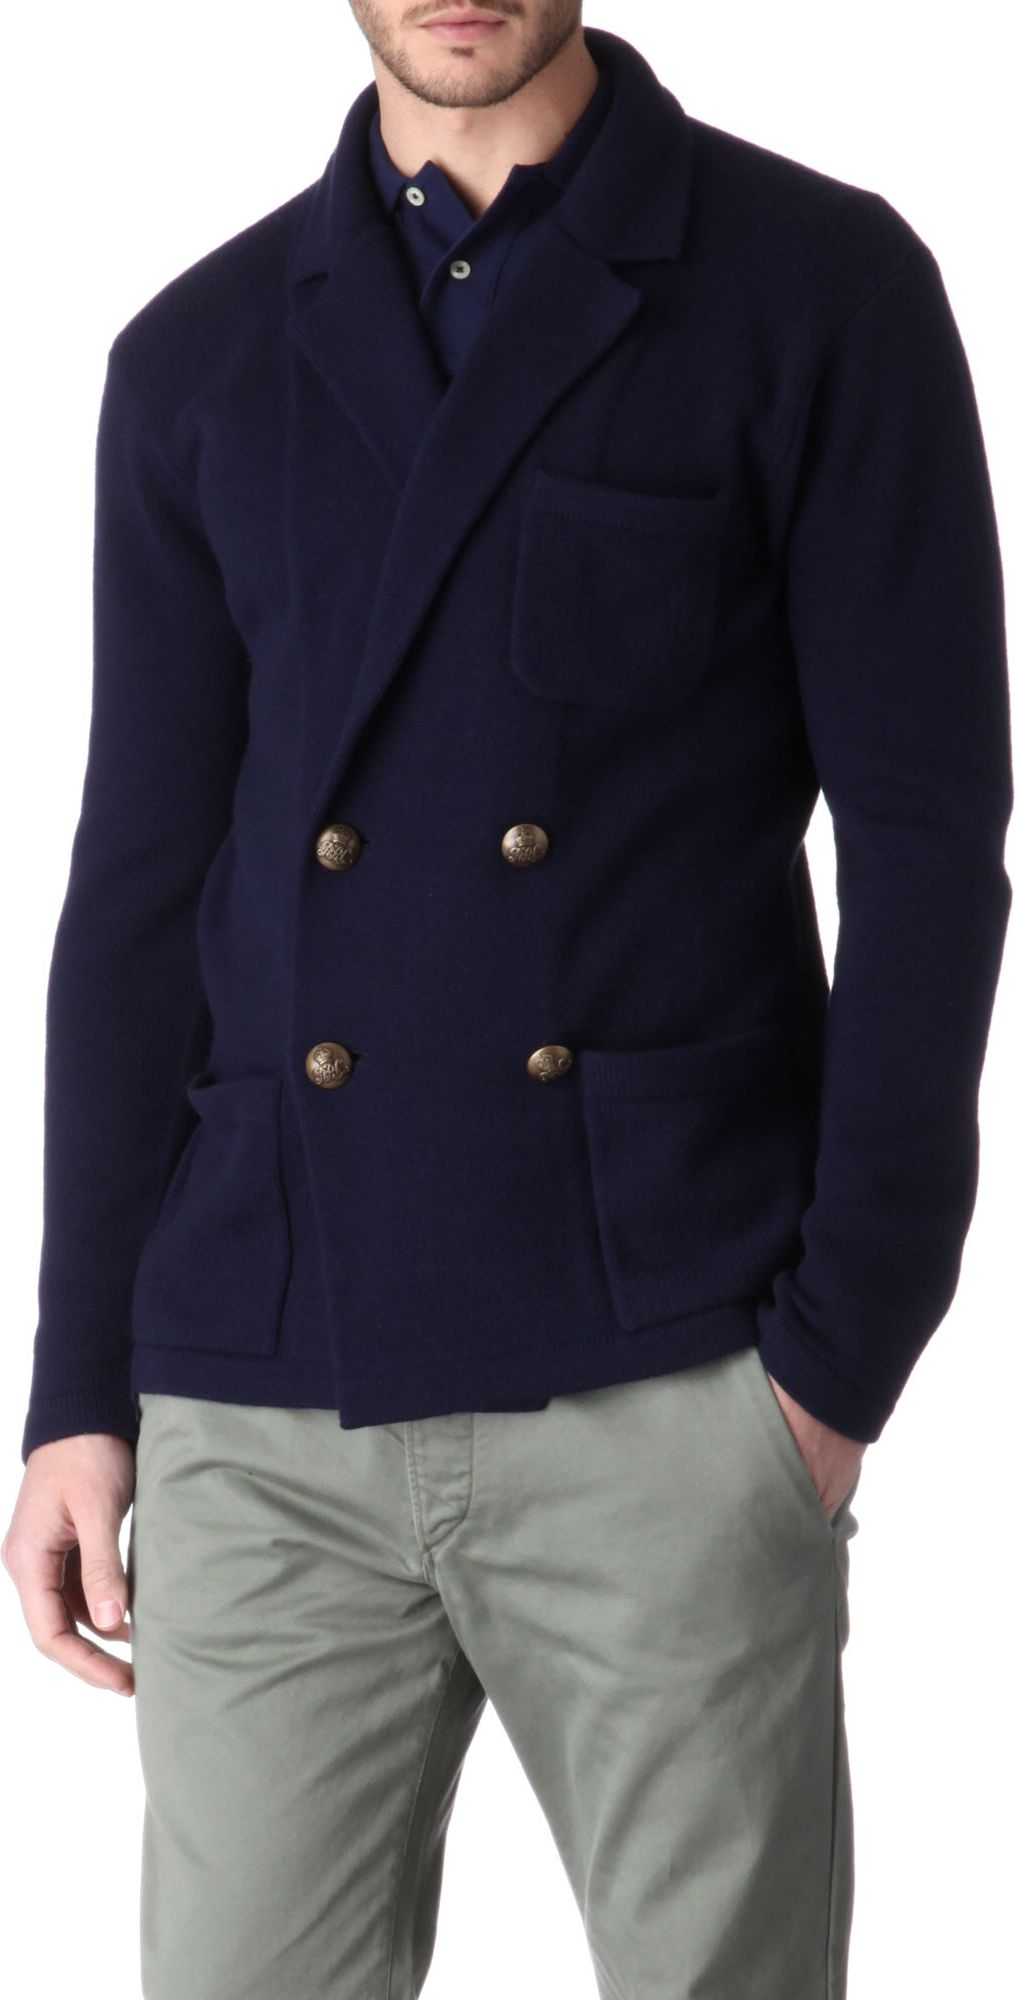 ralph lauren cashmere blazer in blue for men navy lyst. Black Bedroom Furniture Sets. Home Design Ideas